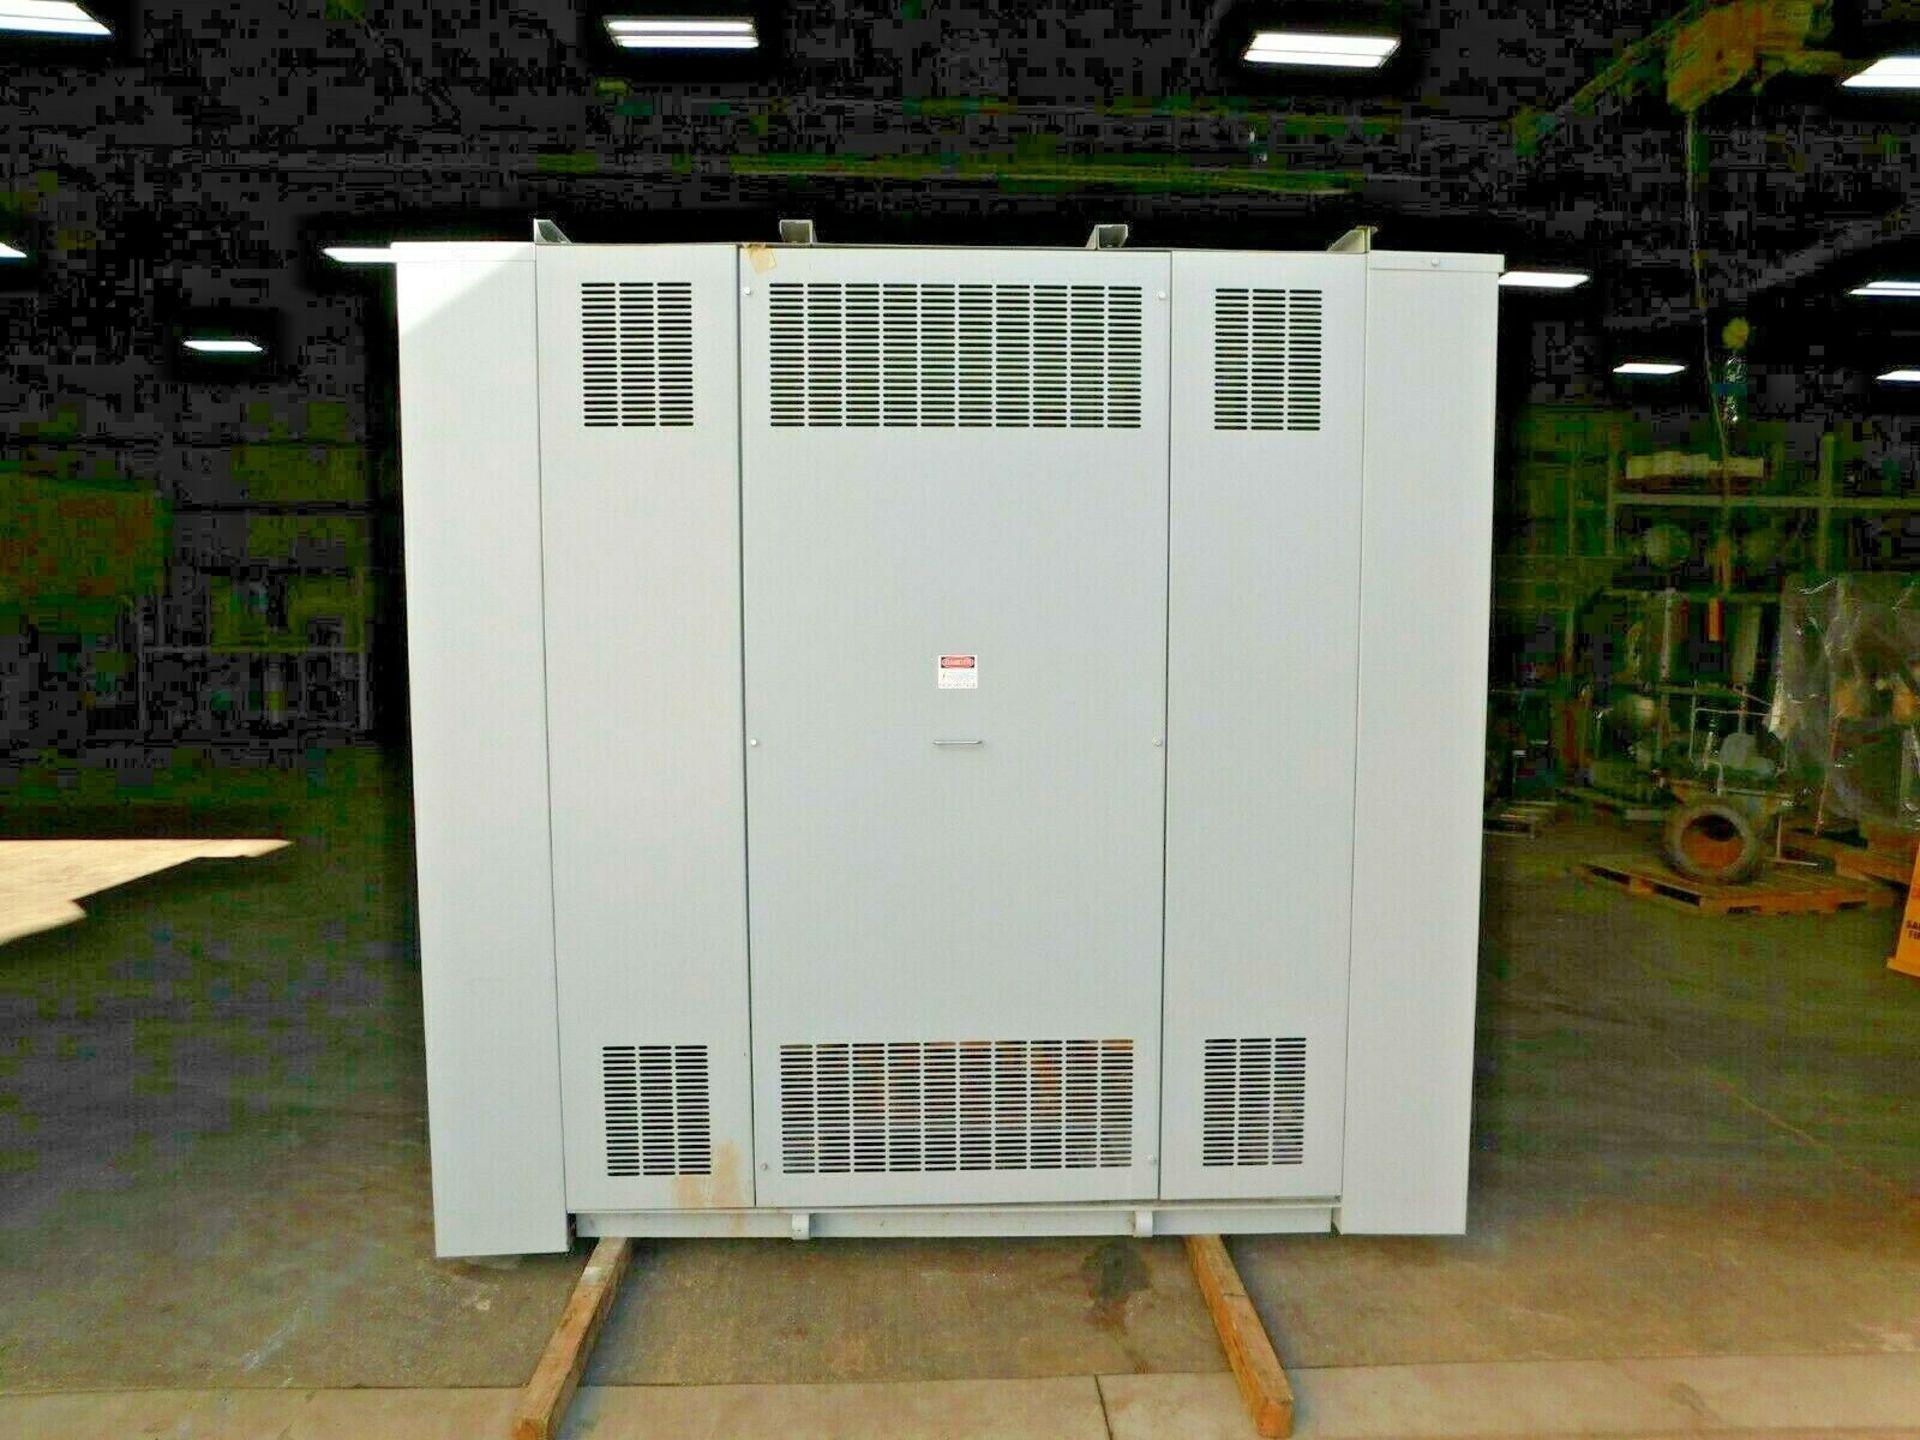 ABB 500 KVA Dry Type Transformer. 3 Ph. 4160 HV. 480 LV. 60 Hz. - Image 4 of 5